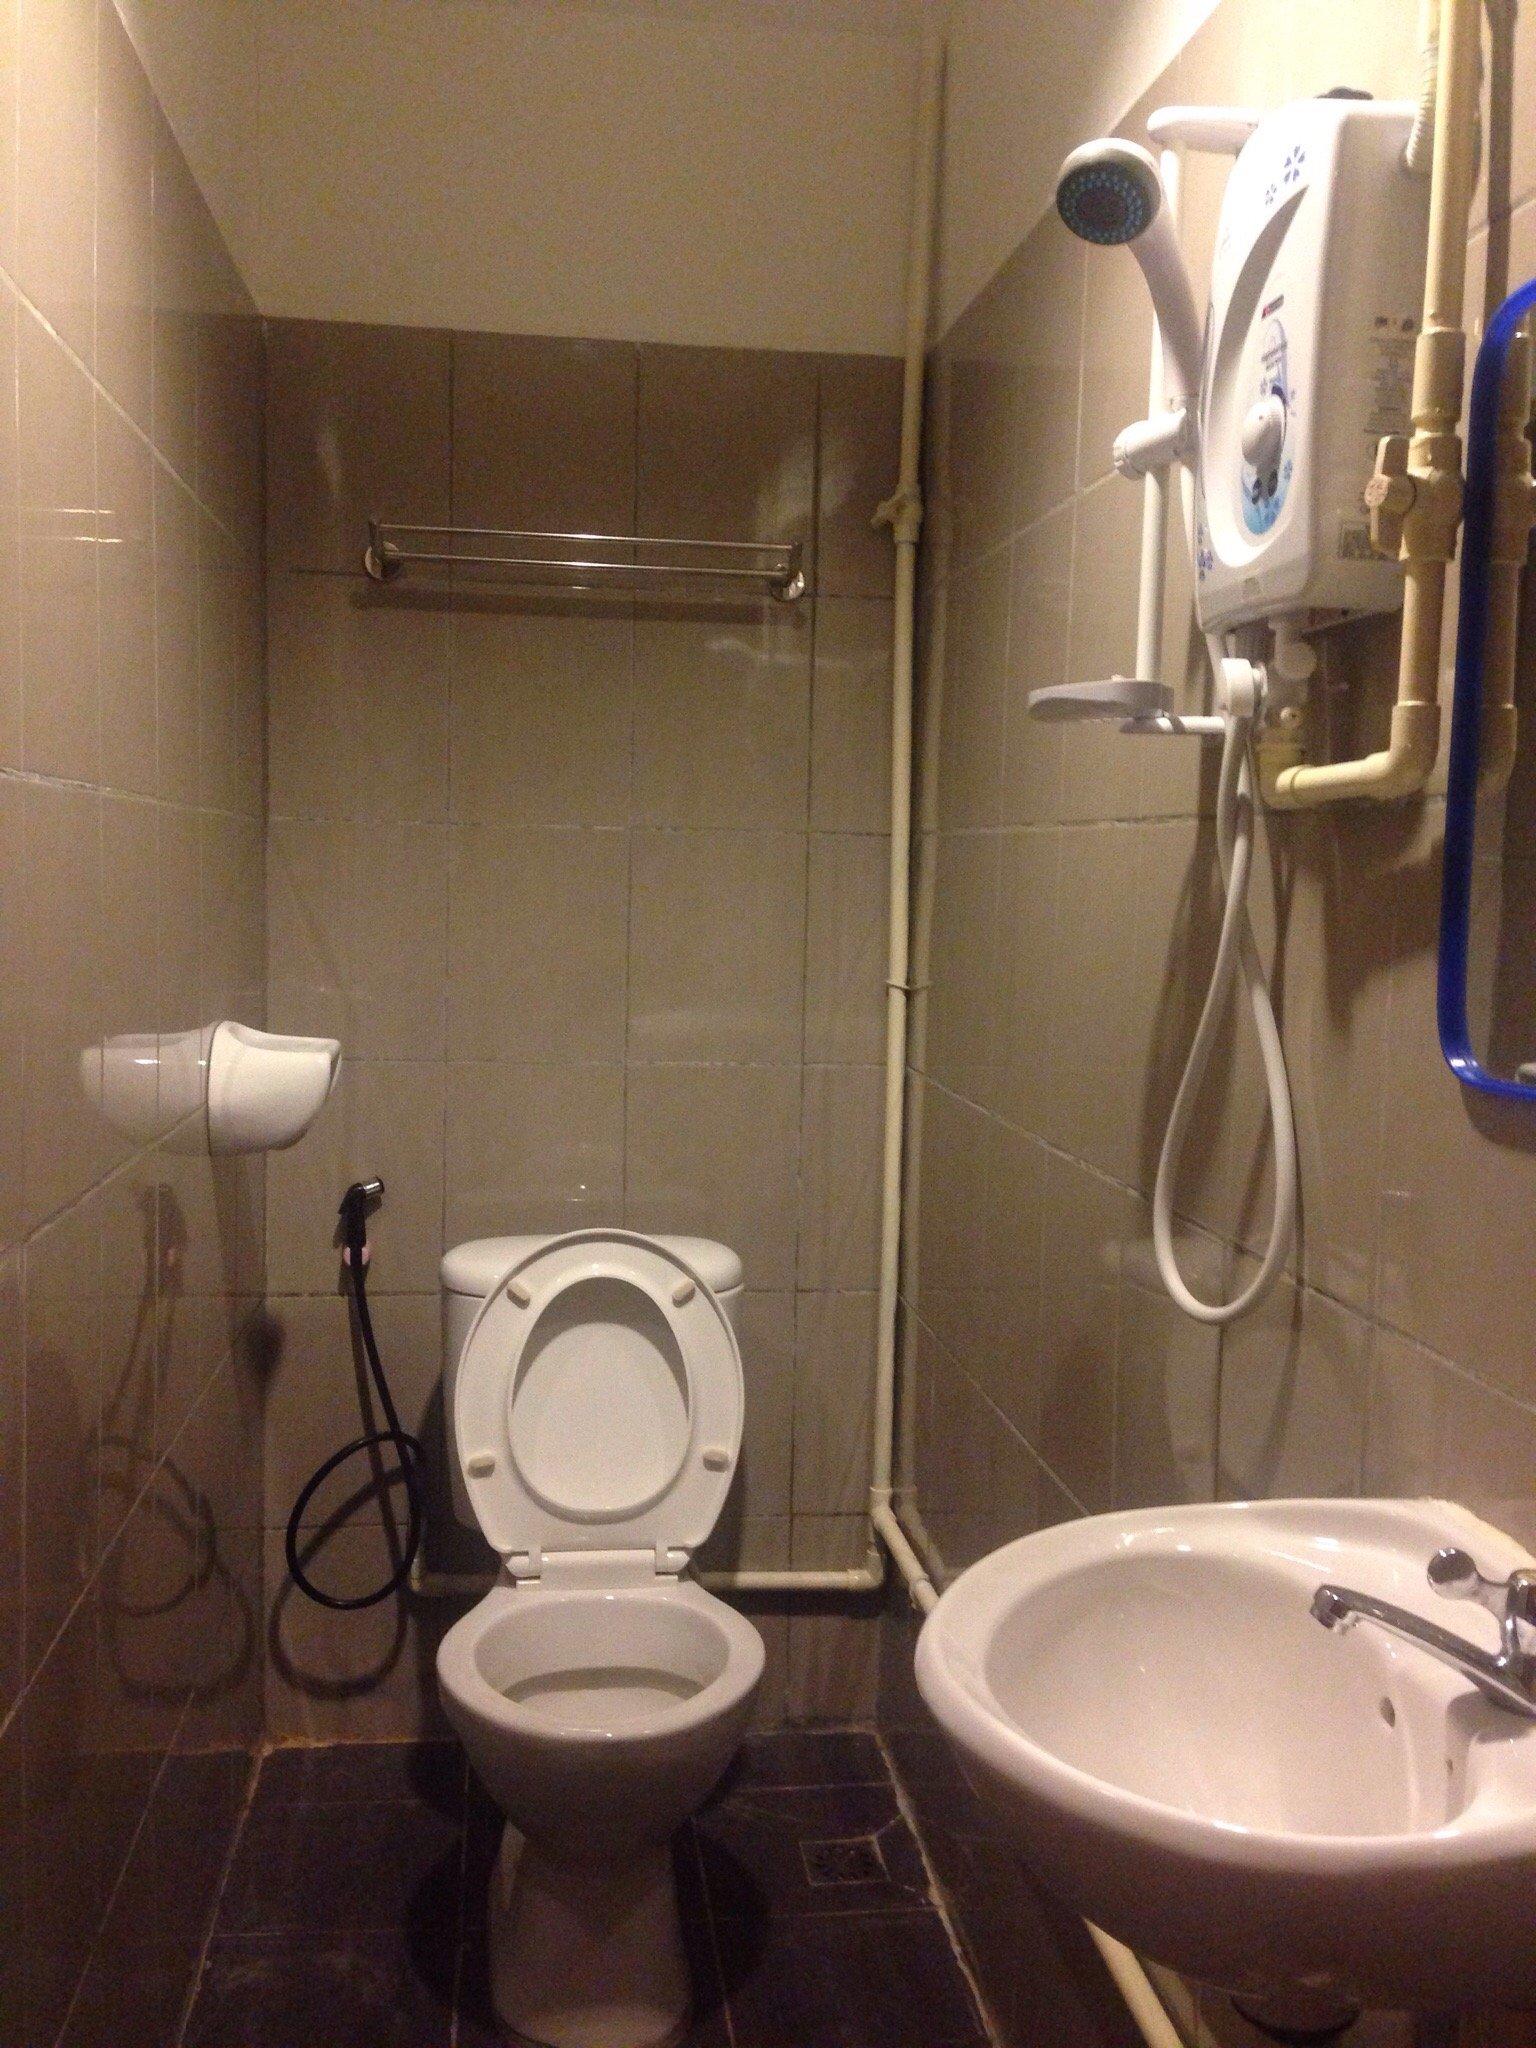 bathroom accessories kota kinabalu story tel kota kinabalu malaysia hotell anmeldelser og prissammenligning tripadvisor - Bathroom Accessories Kota Kinabalu